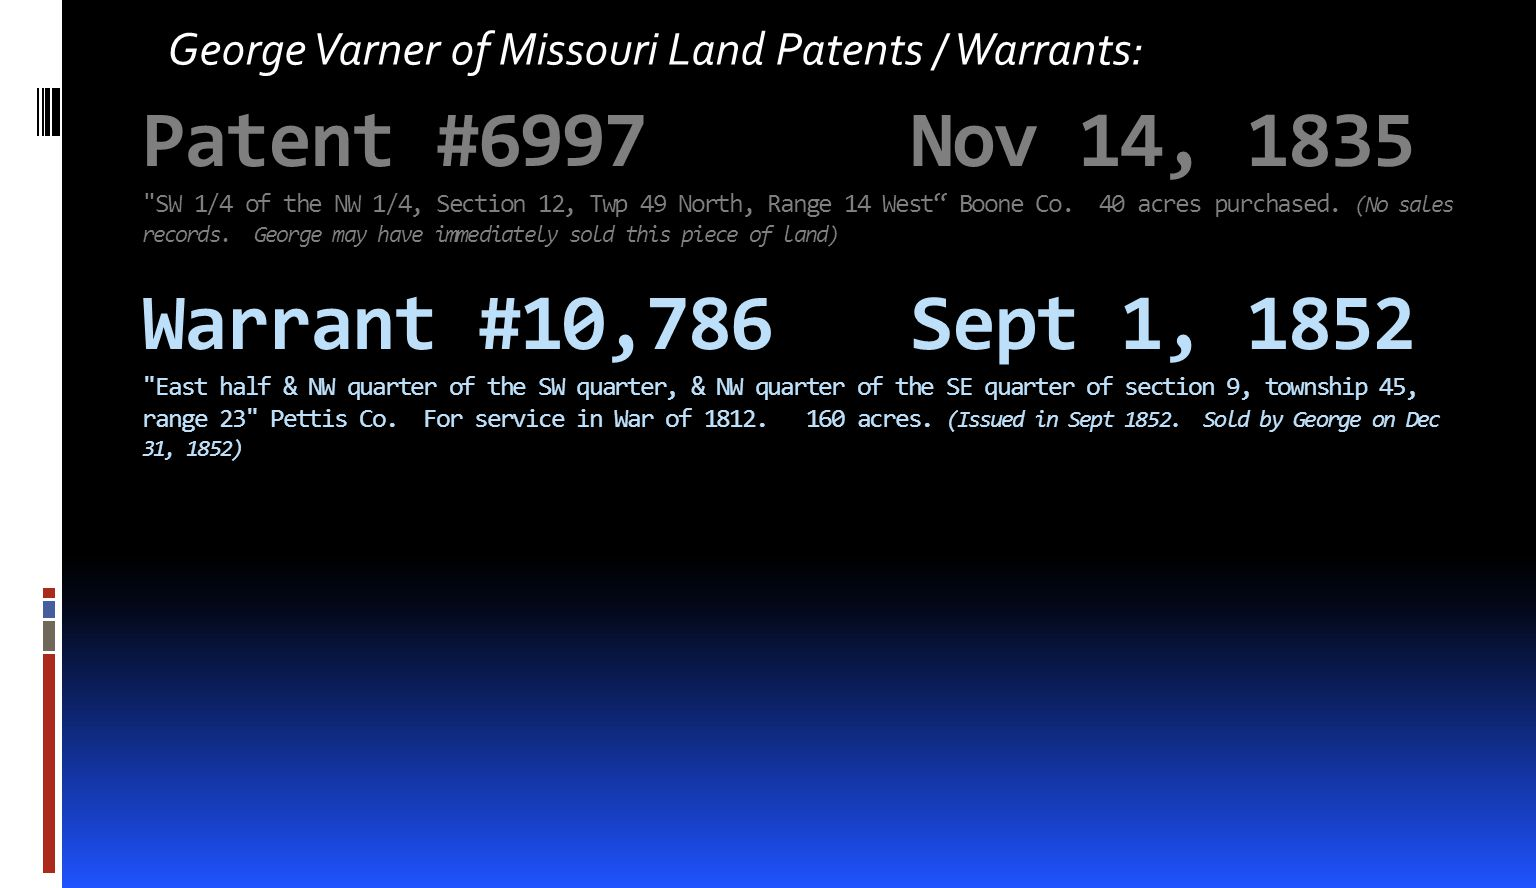 Patent #6997Nov 14, 1835